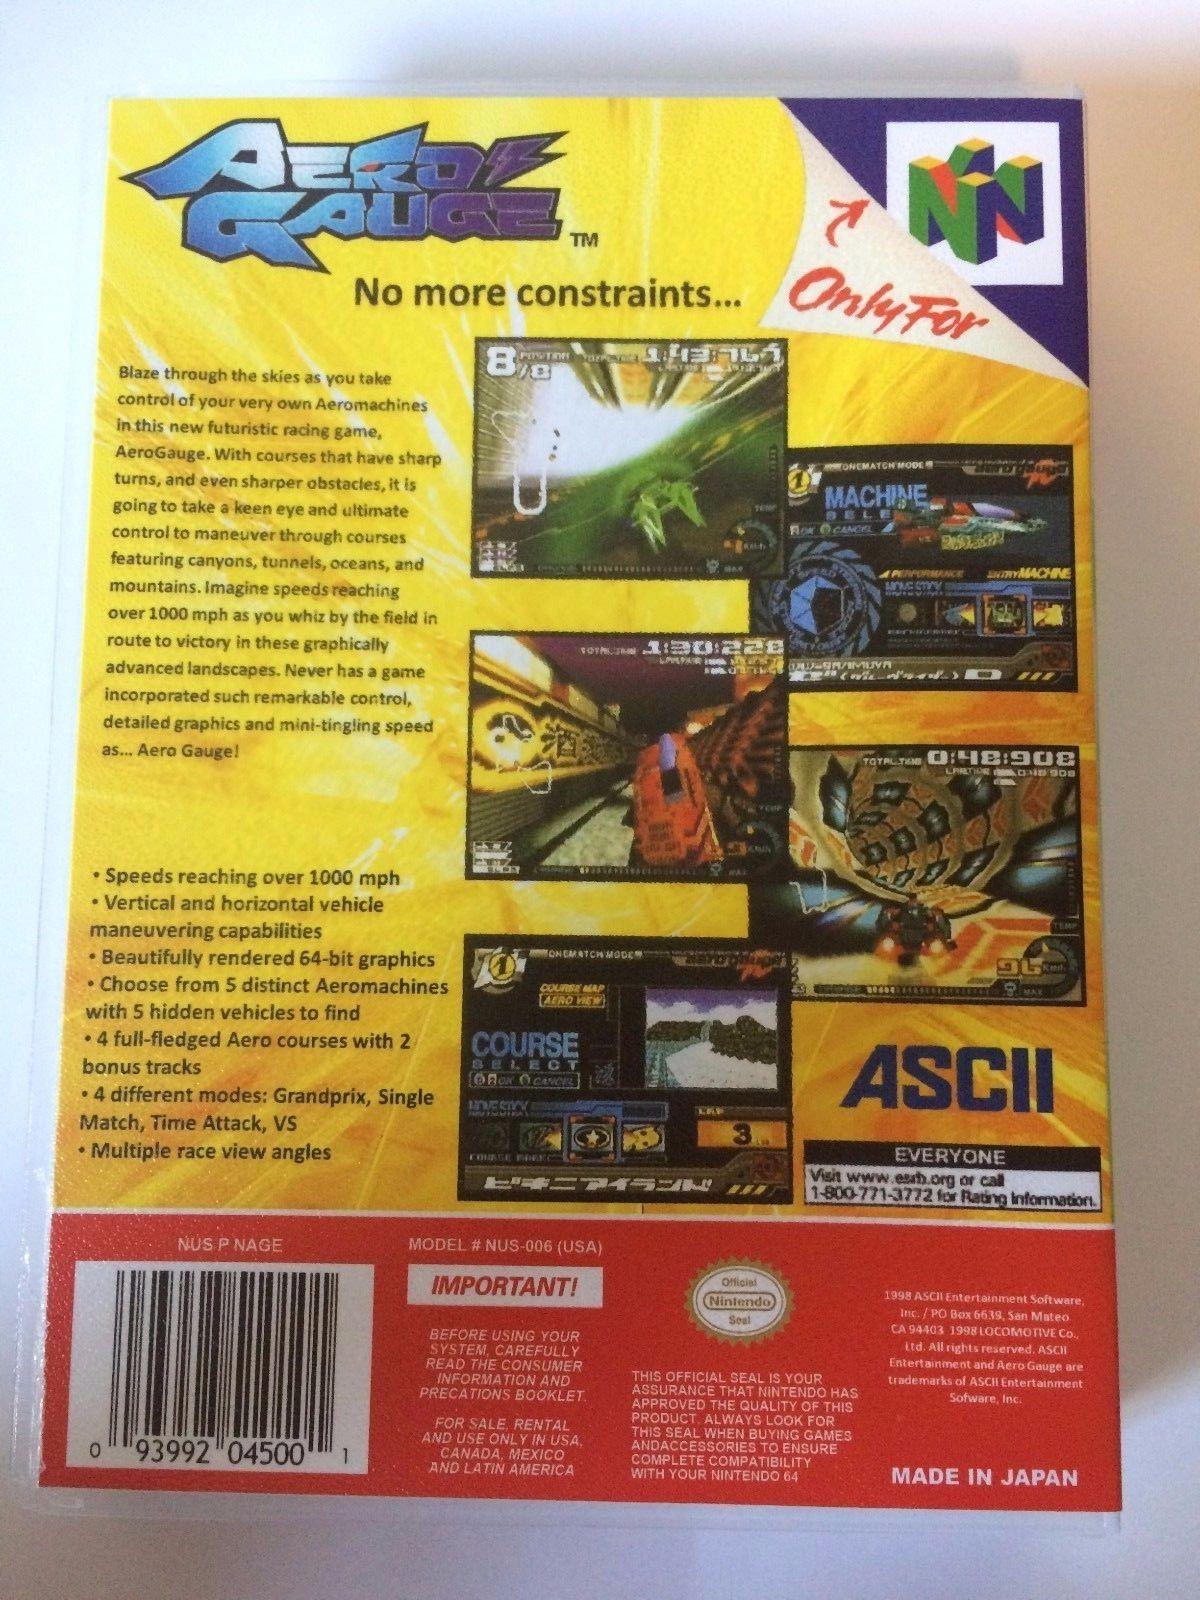 Aero Gauge - Nintendo 64 - Replacement Case - No Game